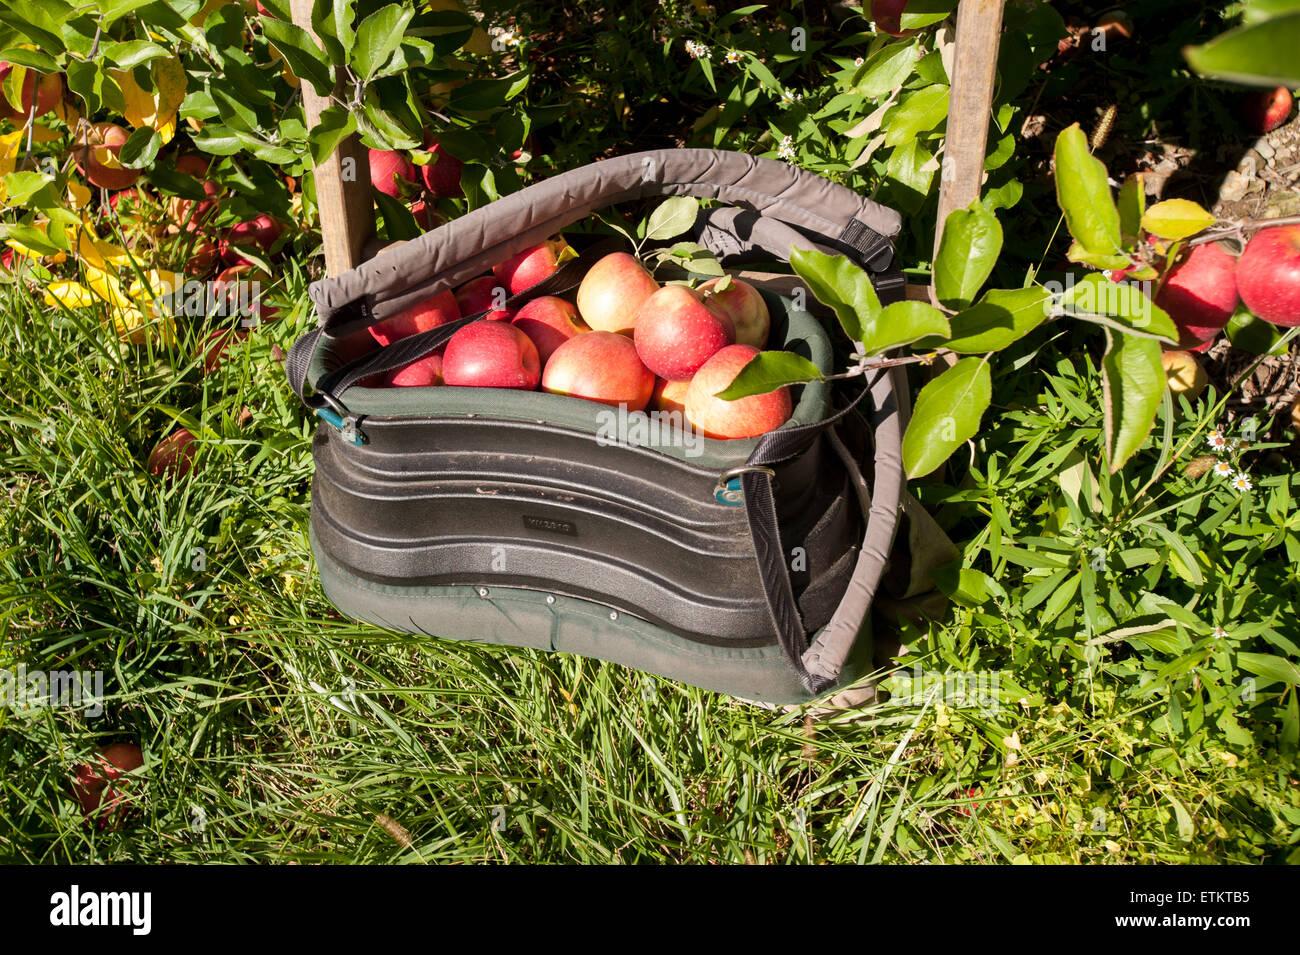 Bag Apples Apple Picking Orchard Stock Photos & Bag Apples